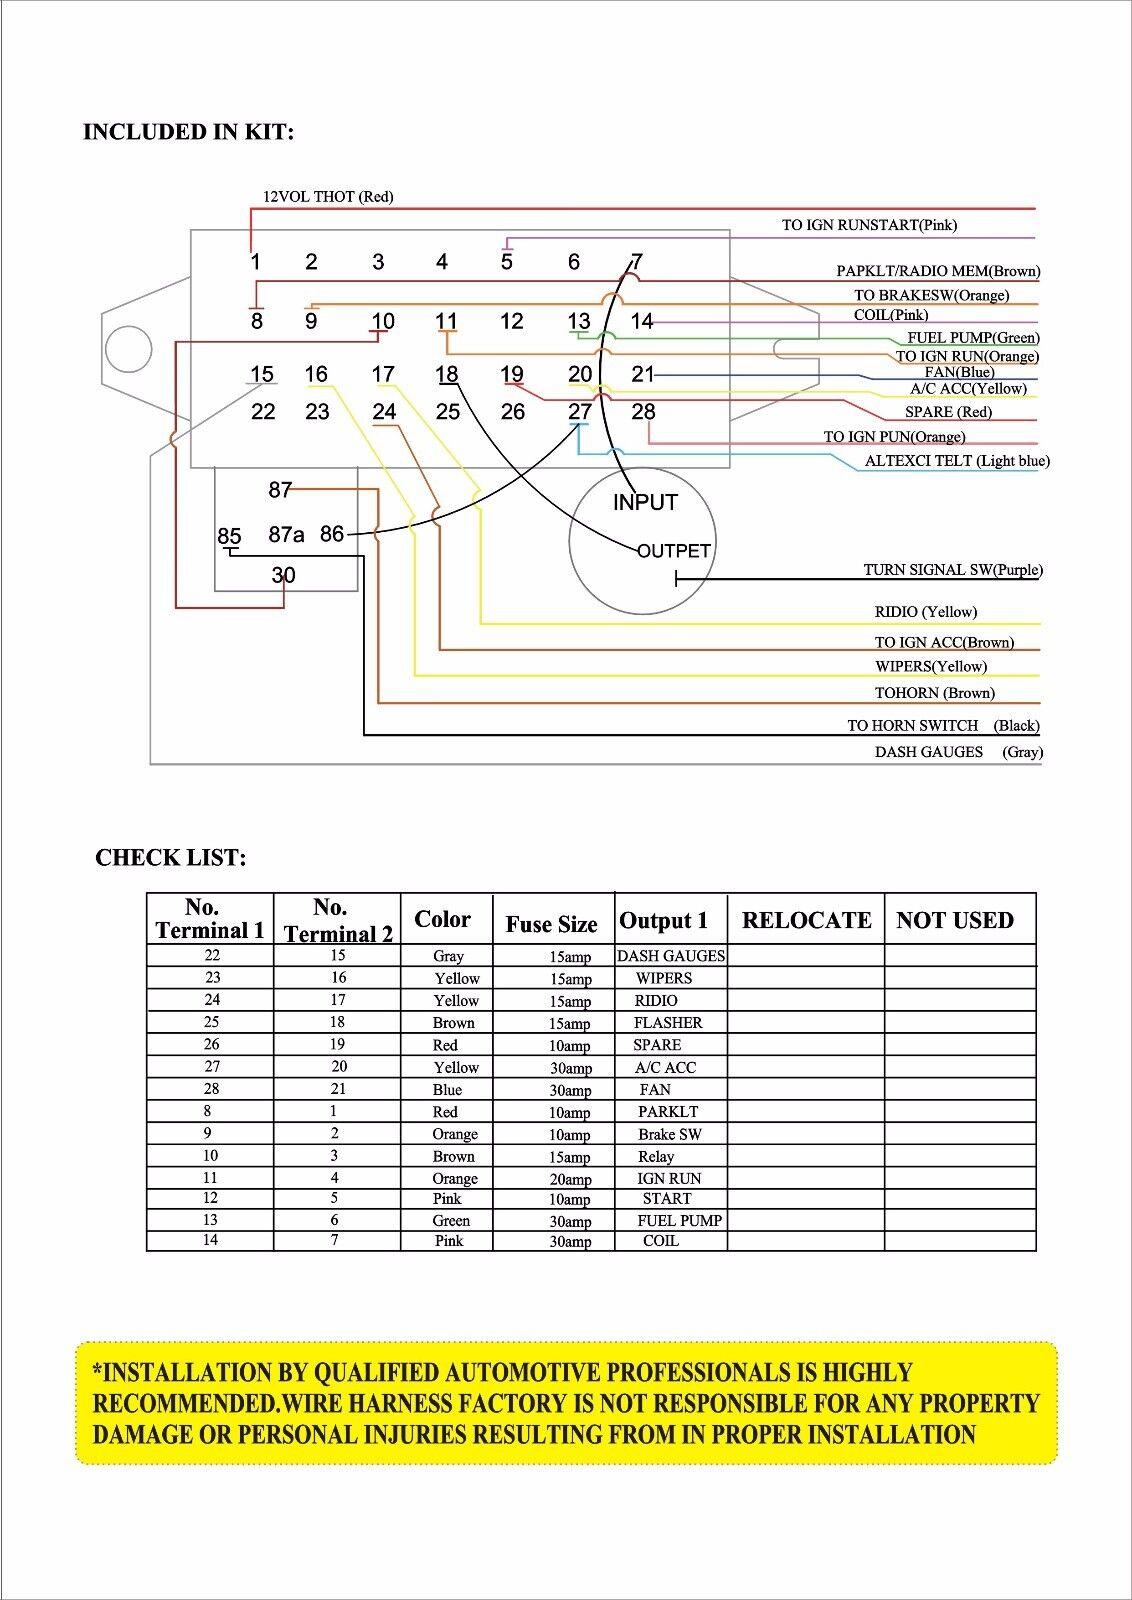 12 Circuit Wiring Harness Diagram Good 1st Vw Bug Complete Basic Wire Fuse Box Street Hot Rat Rod Car Rh Ebay Com Rebel Ez Harnesses For Cars